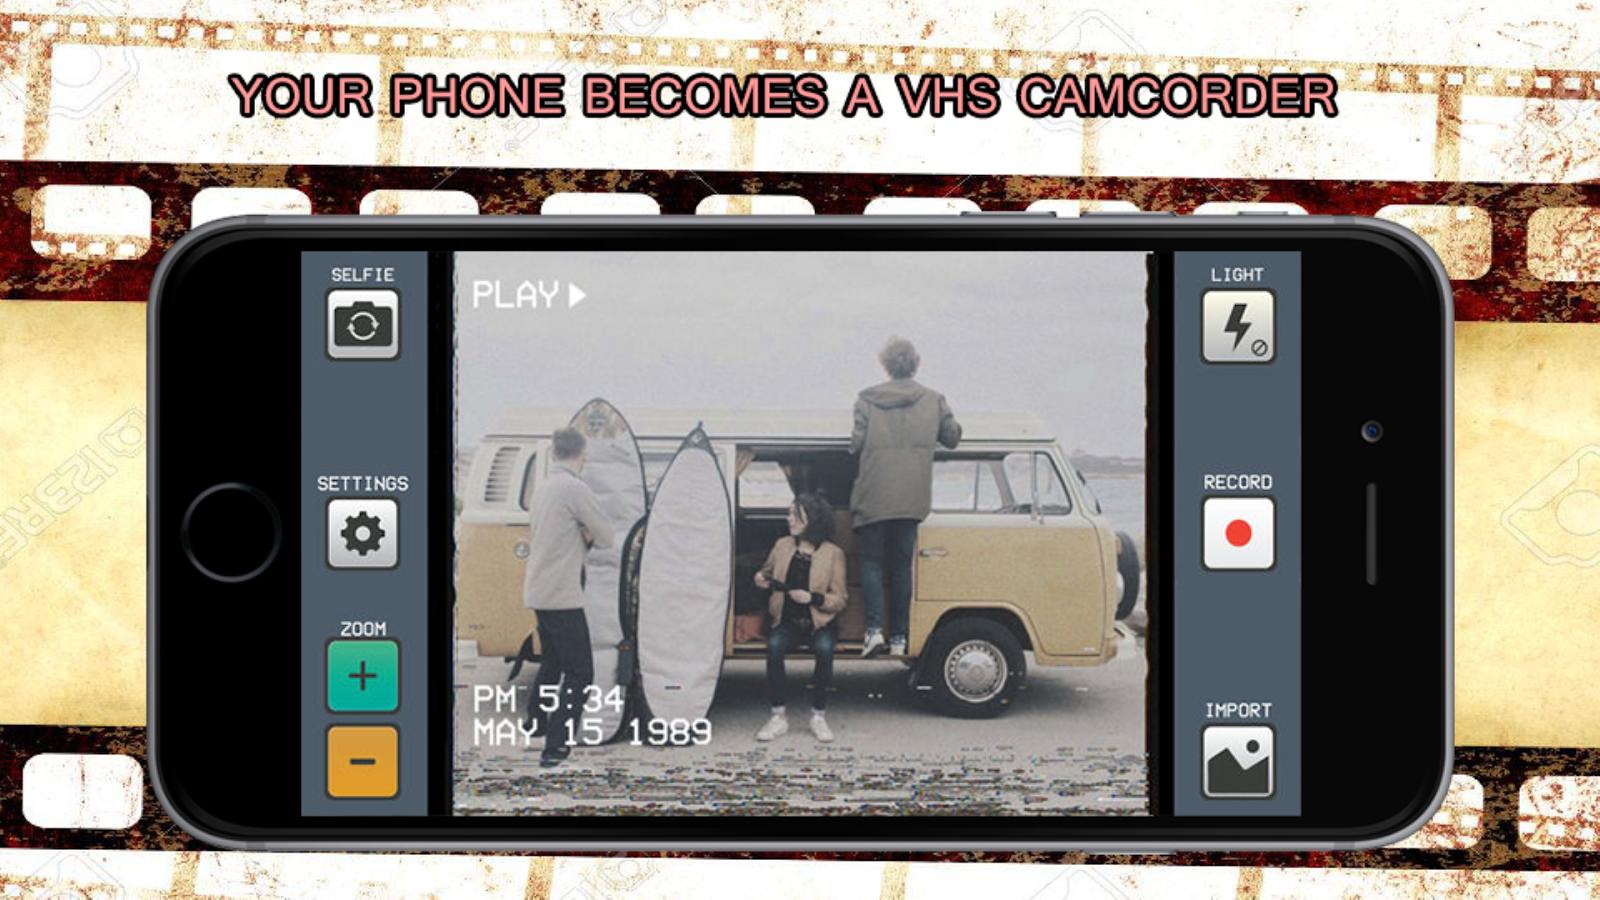 Camcorder - Vhs Home Videos RAD, Make VHS Video 1 1 1 APK